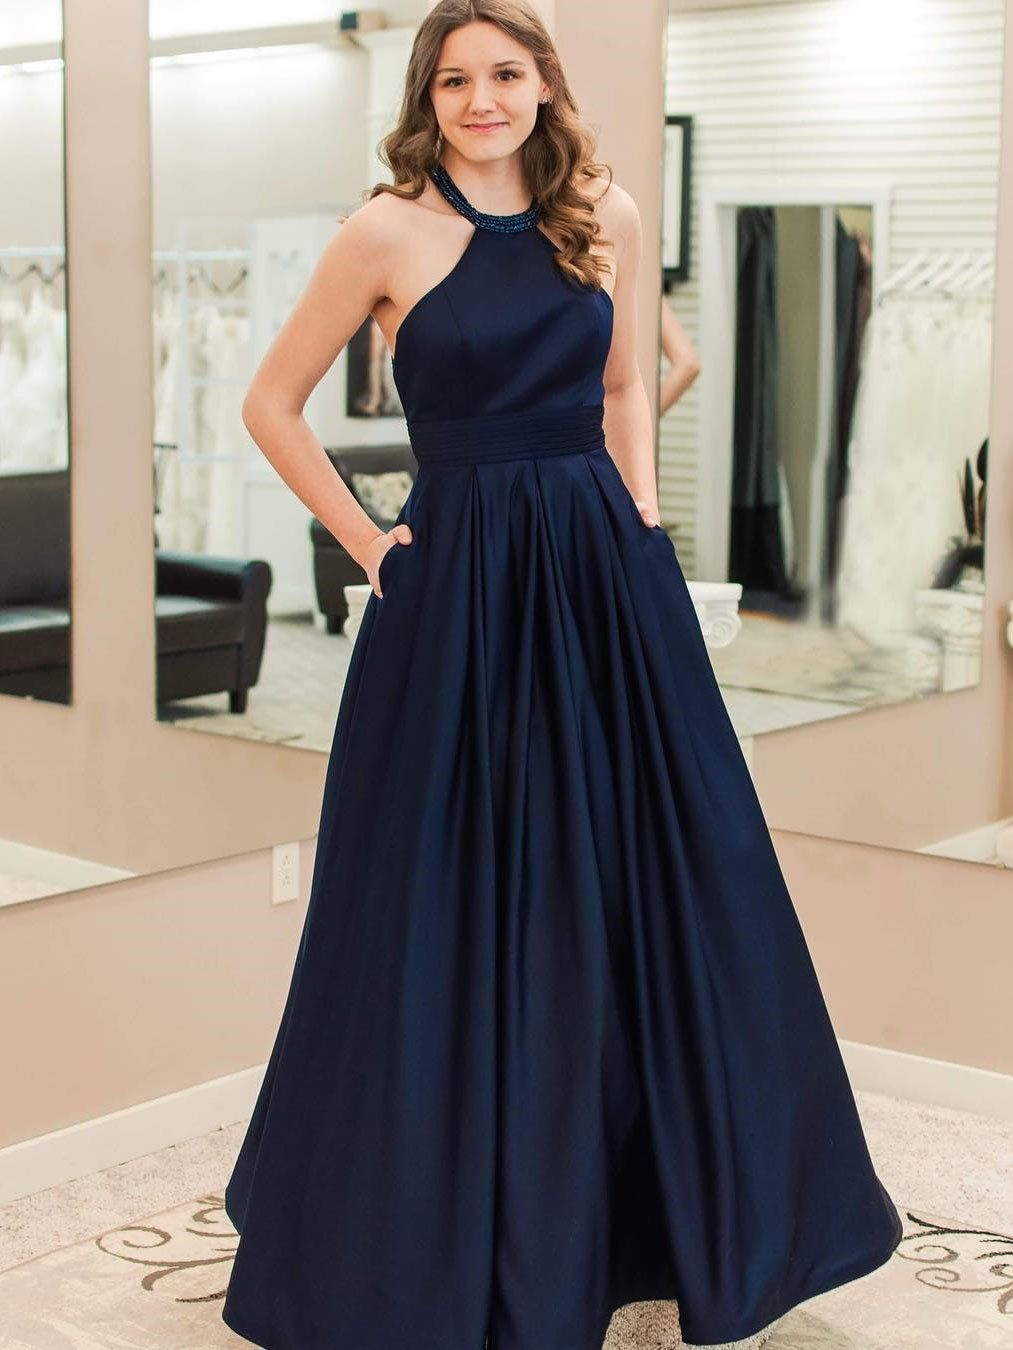 Elegant Prom Dress,Halter Prom Dress,Navy Blue Prom Dress with ...